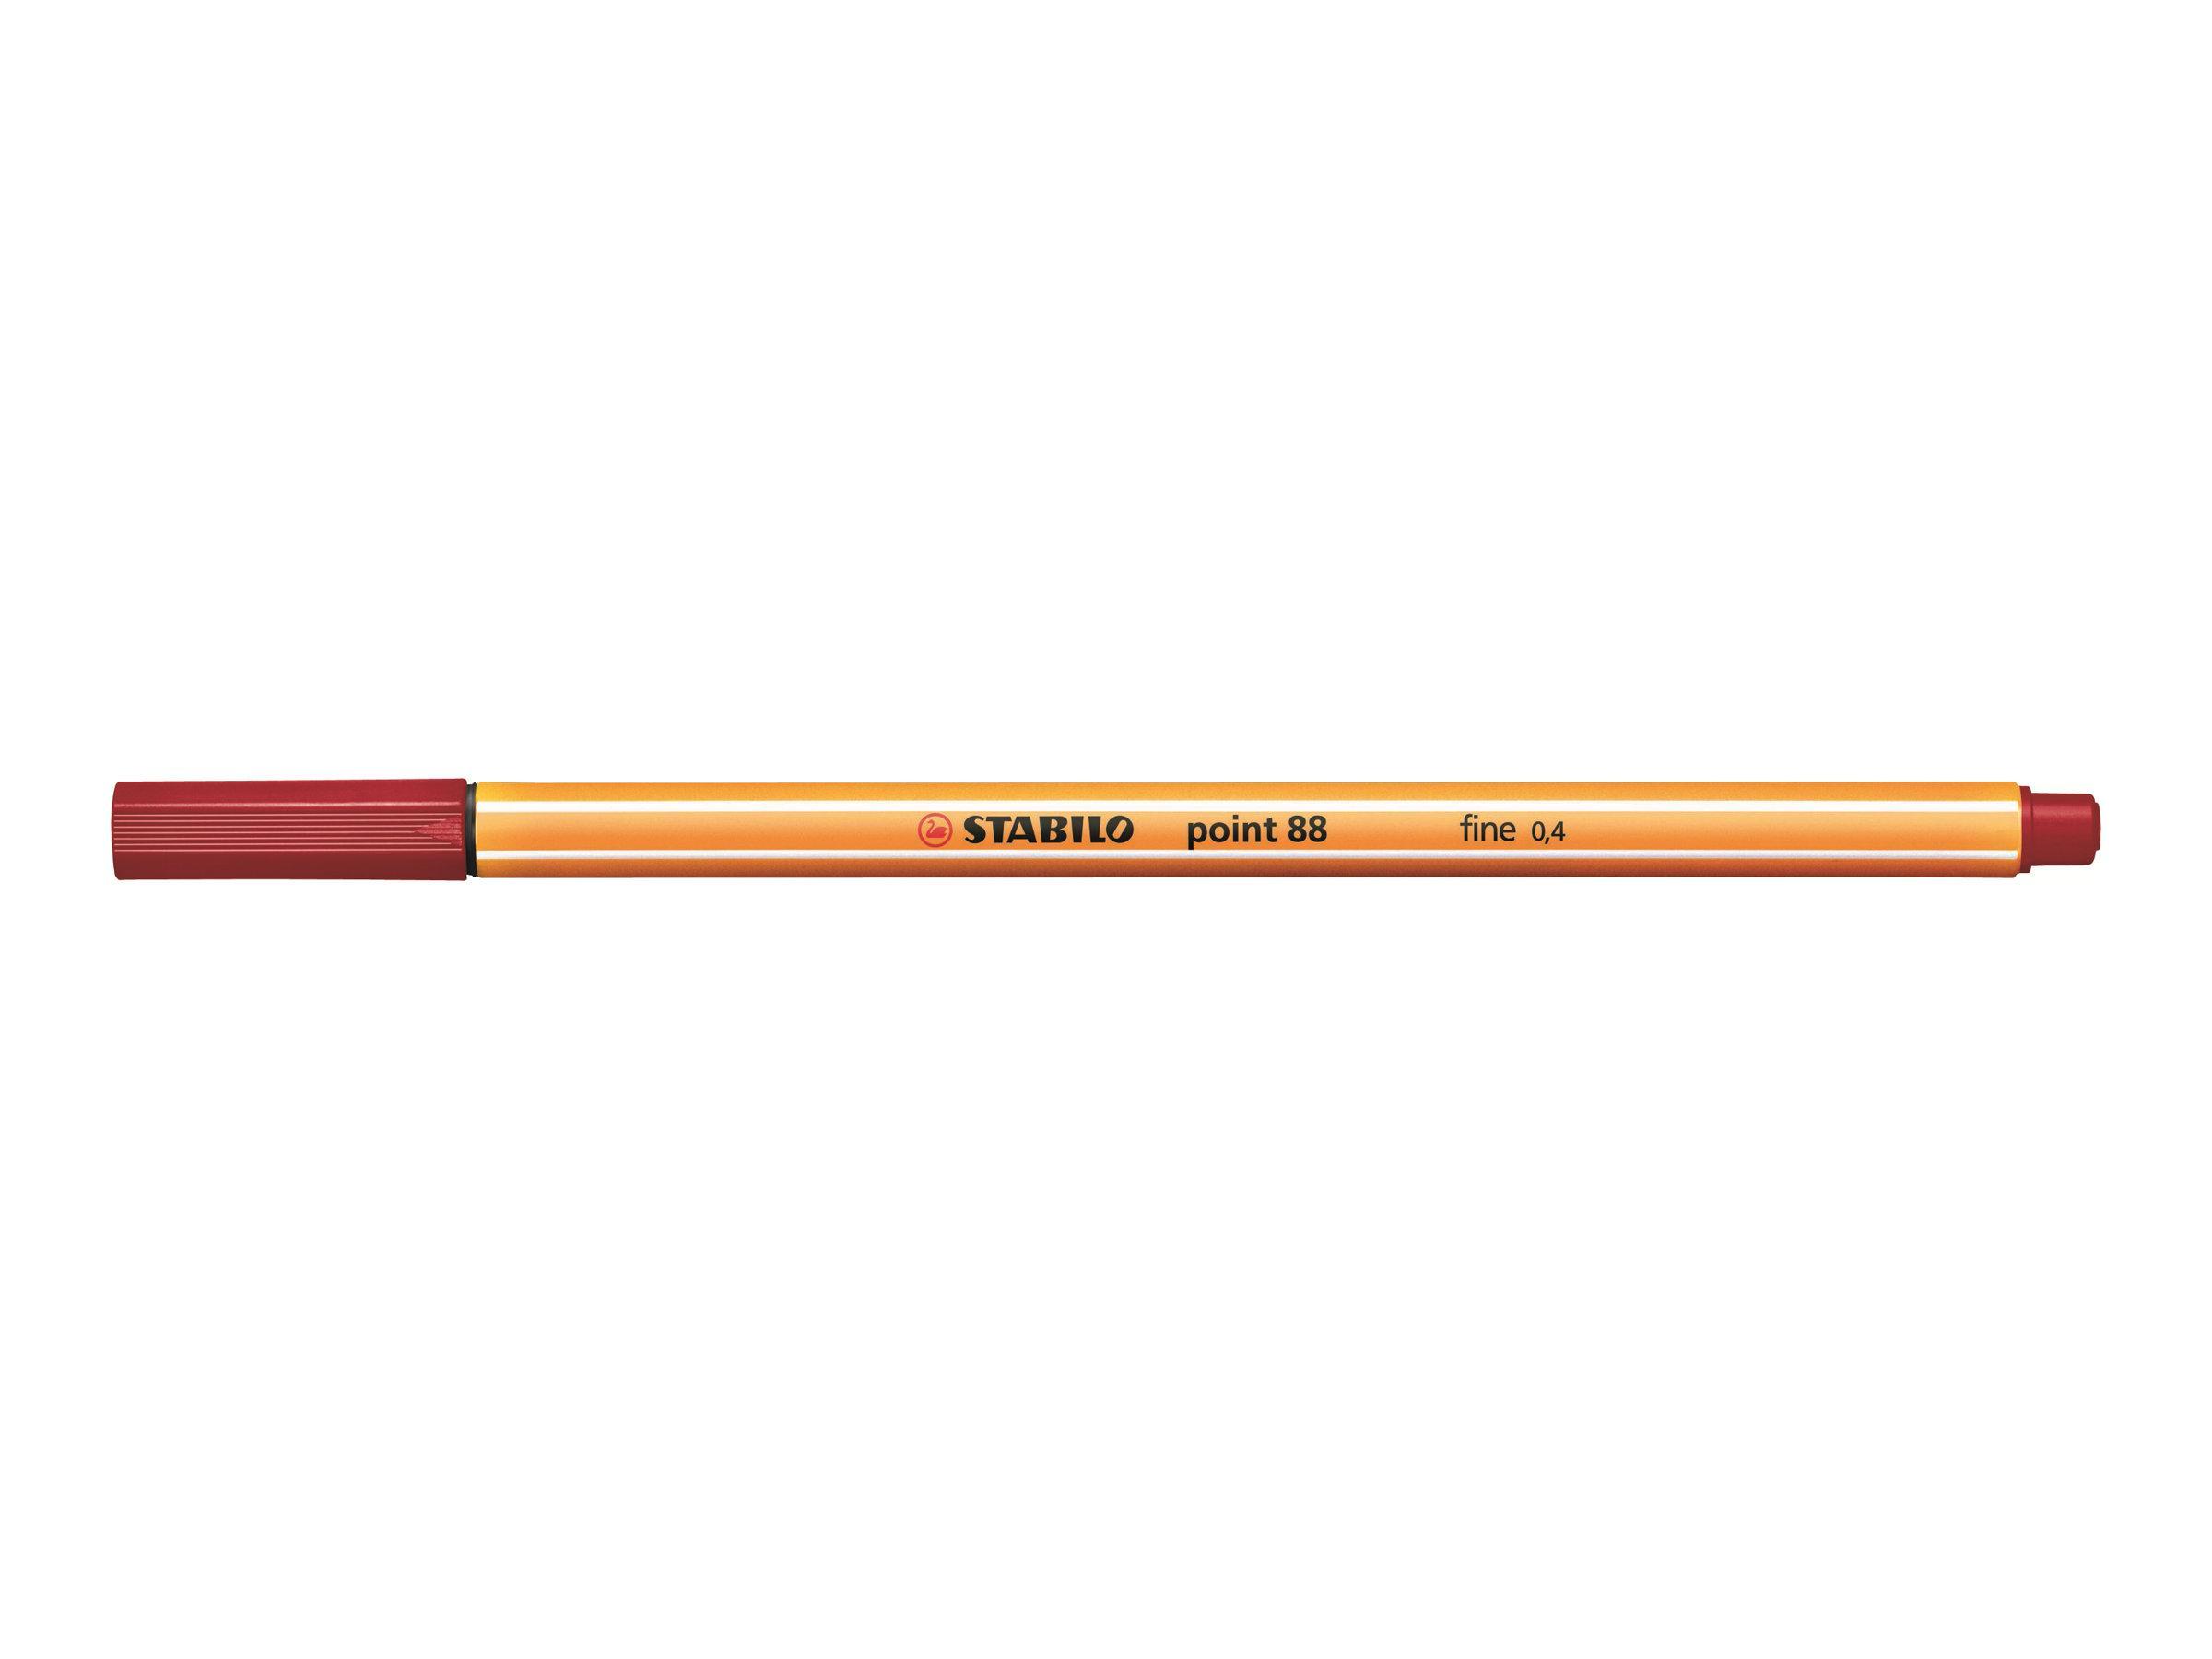 STABILO point 88 - Feutre fin - 0.4 mm - bordeaux